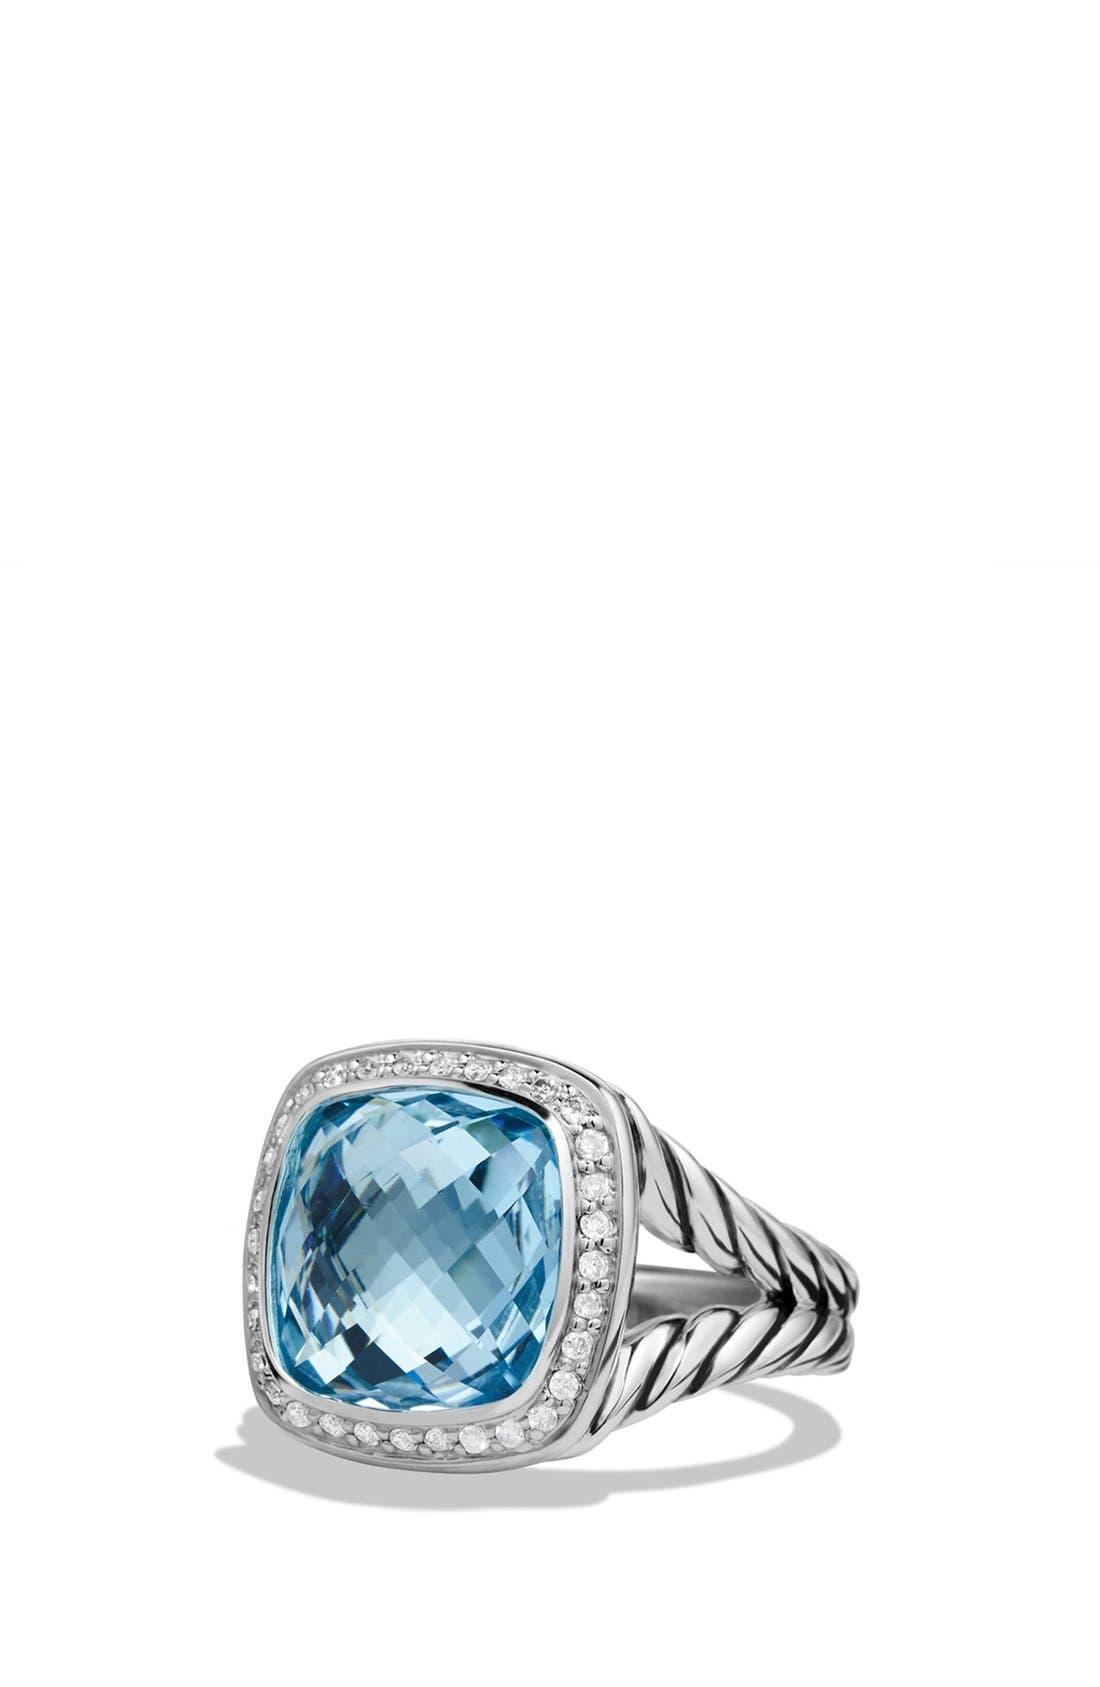 Main Image - David Yurman'Albion' Ring with Semiprecious Stone and Diamonds